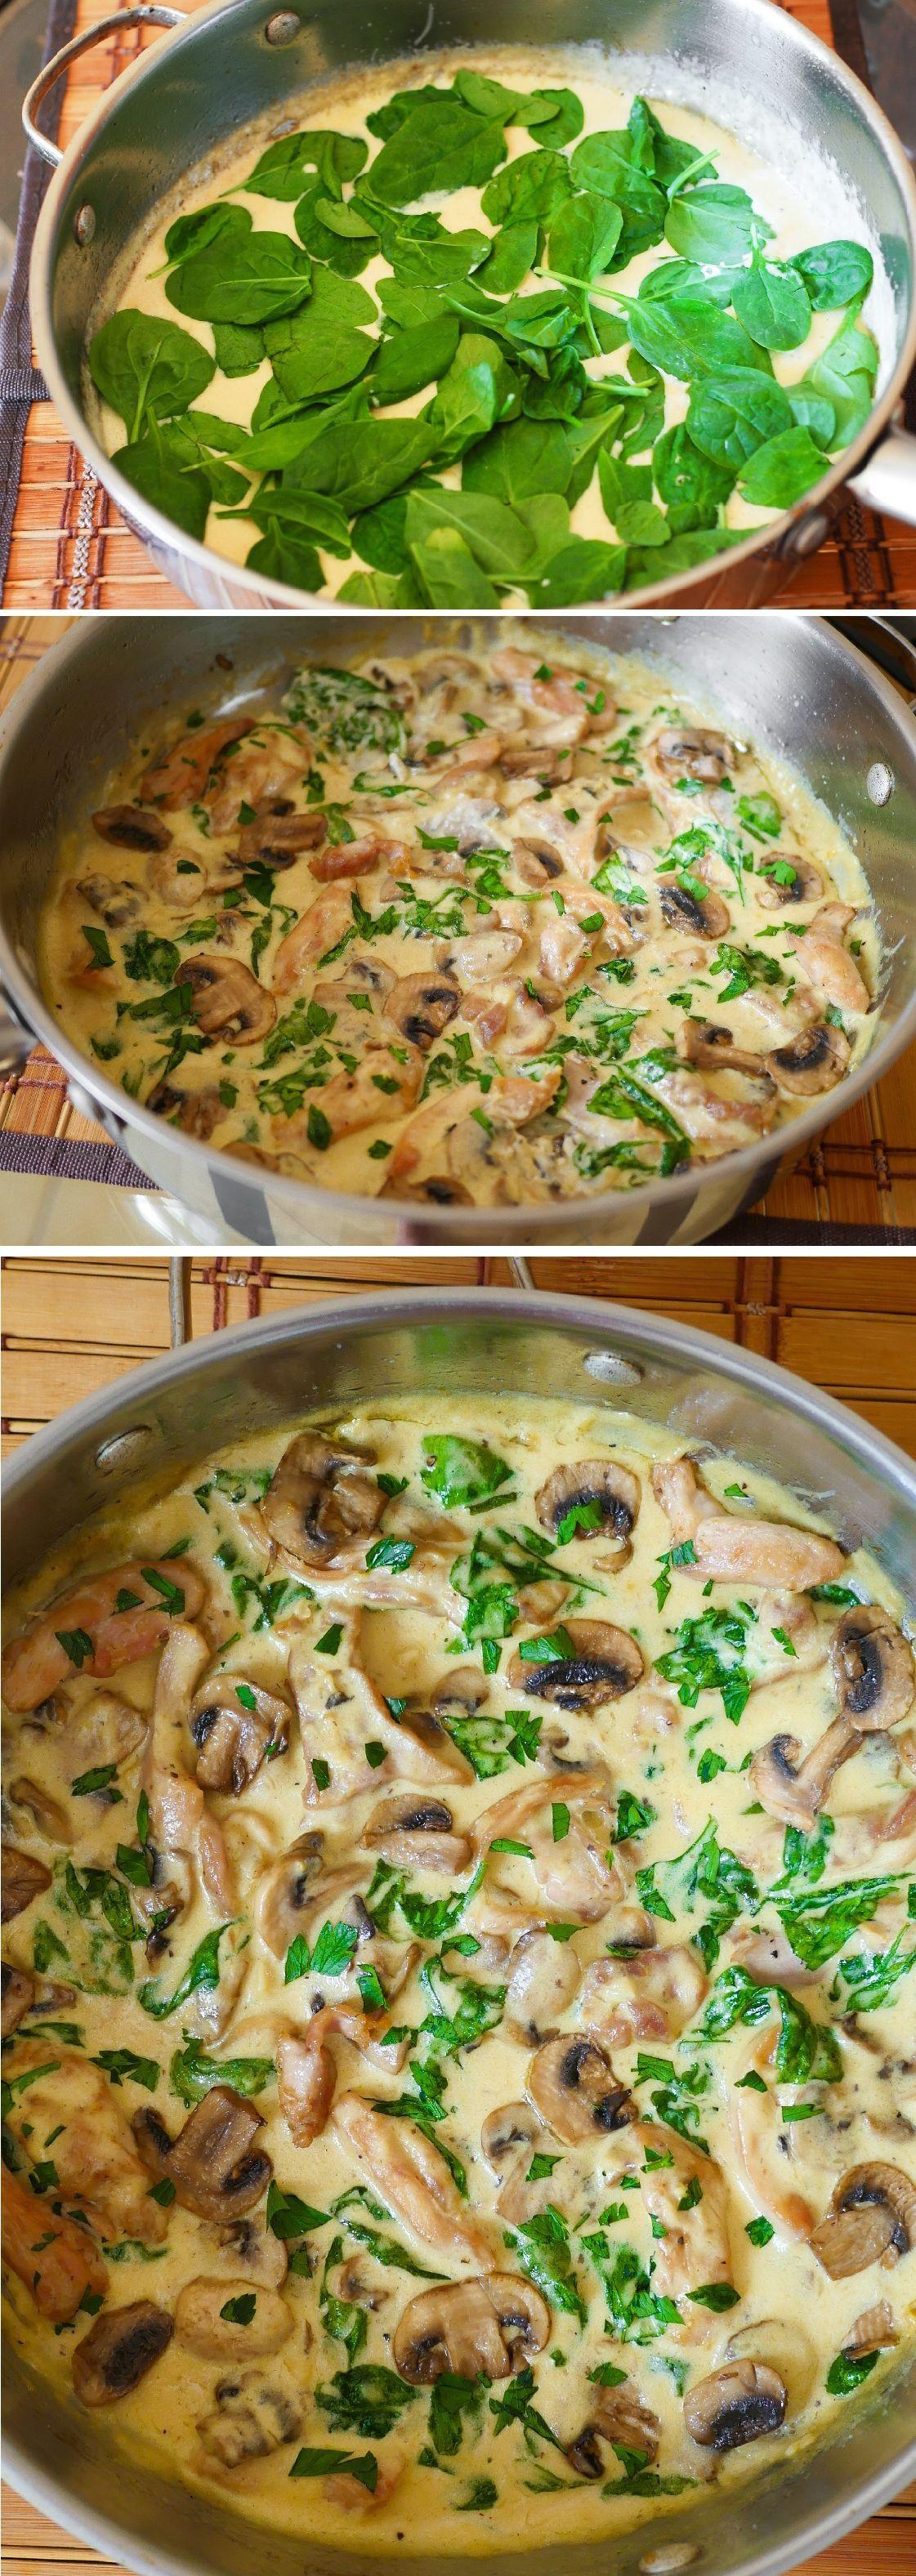 Chicken in Creamy Parmesan Mushroom Sauce